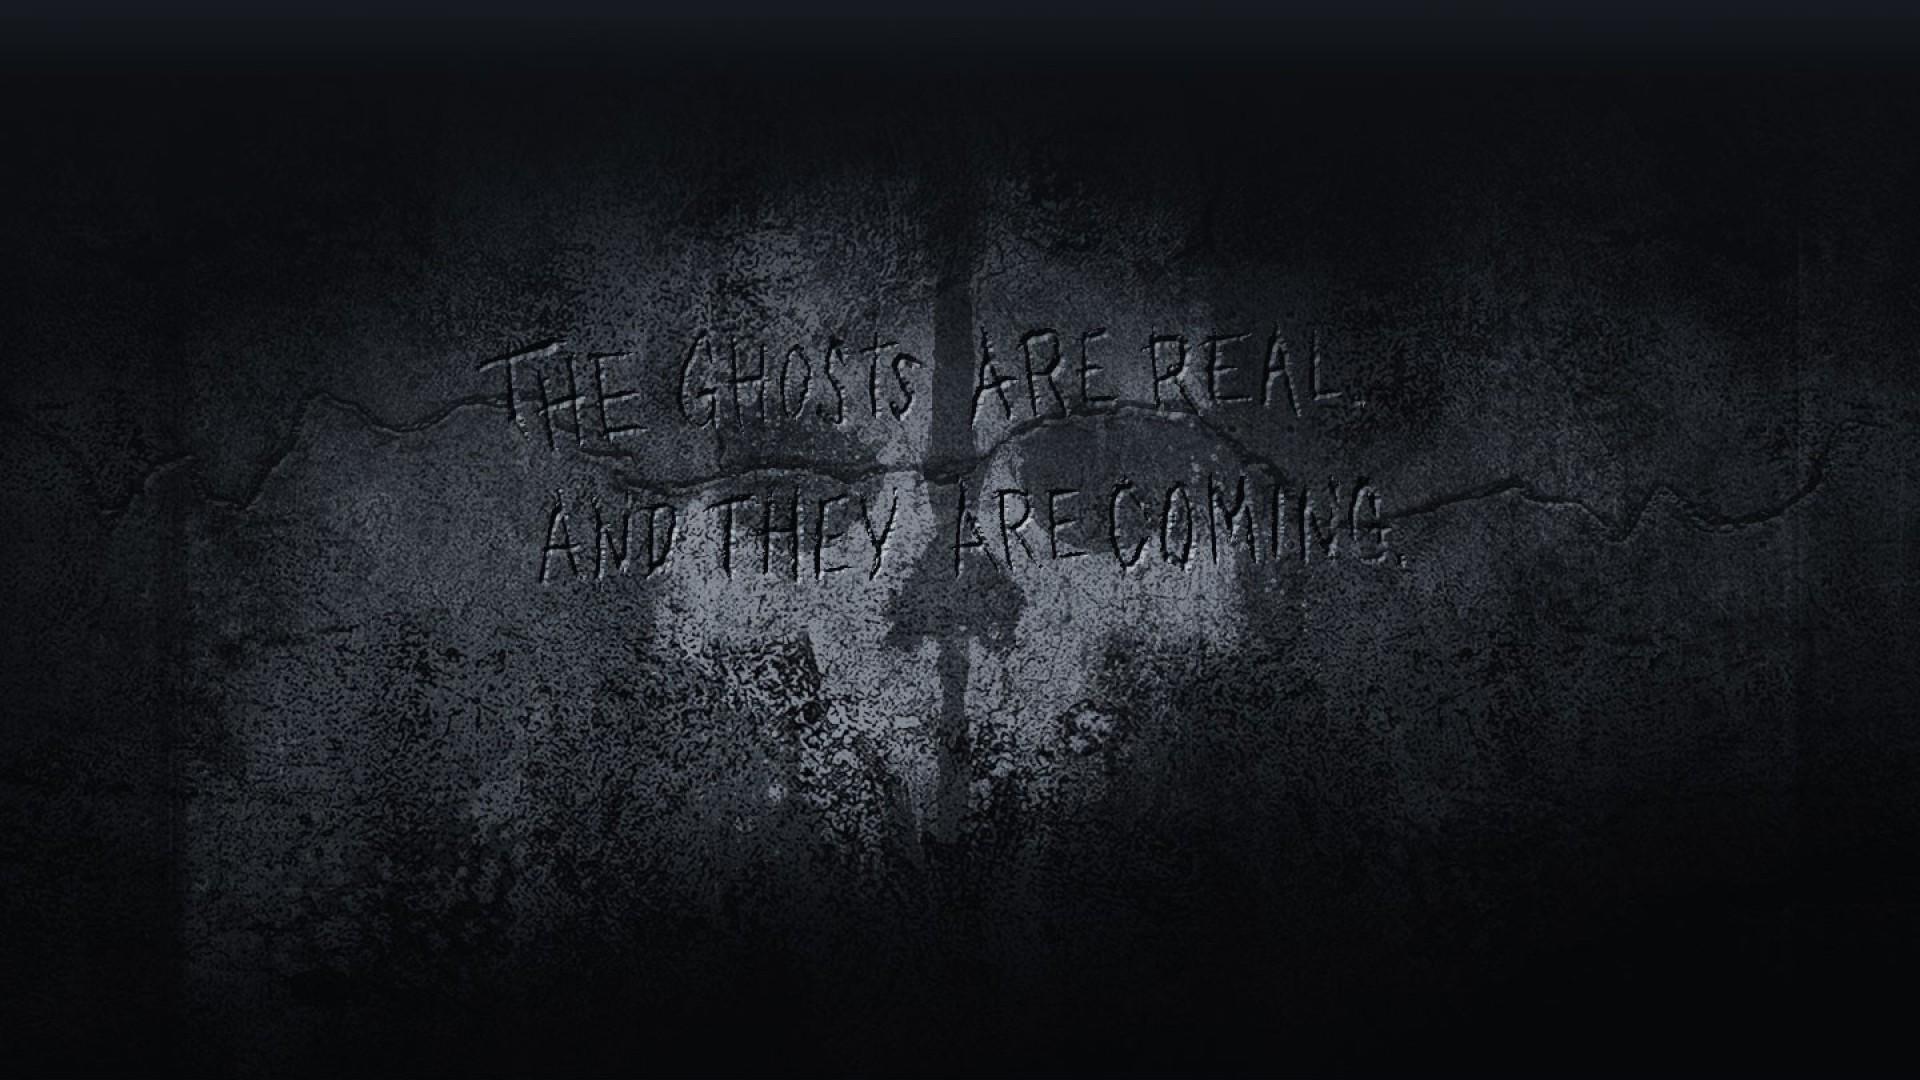 Ghosts Hd Wallpapers - wallpaper hd